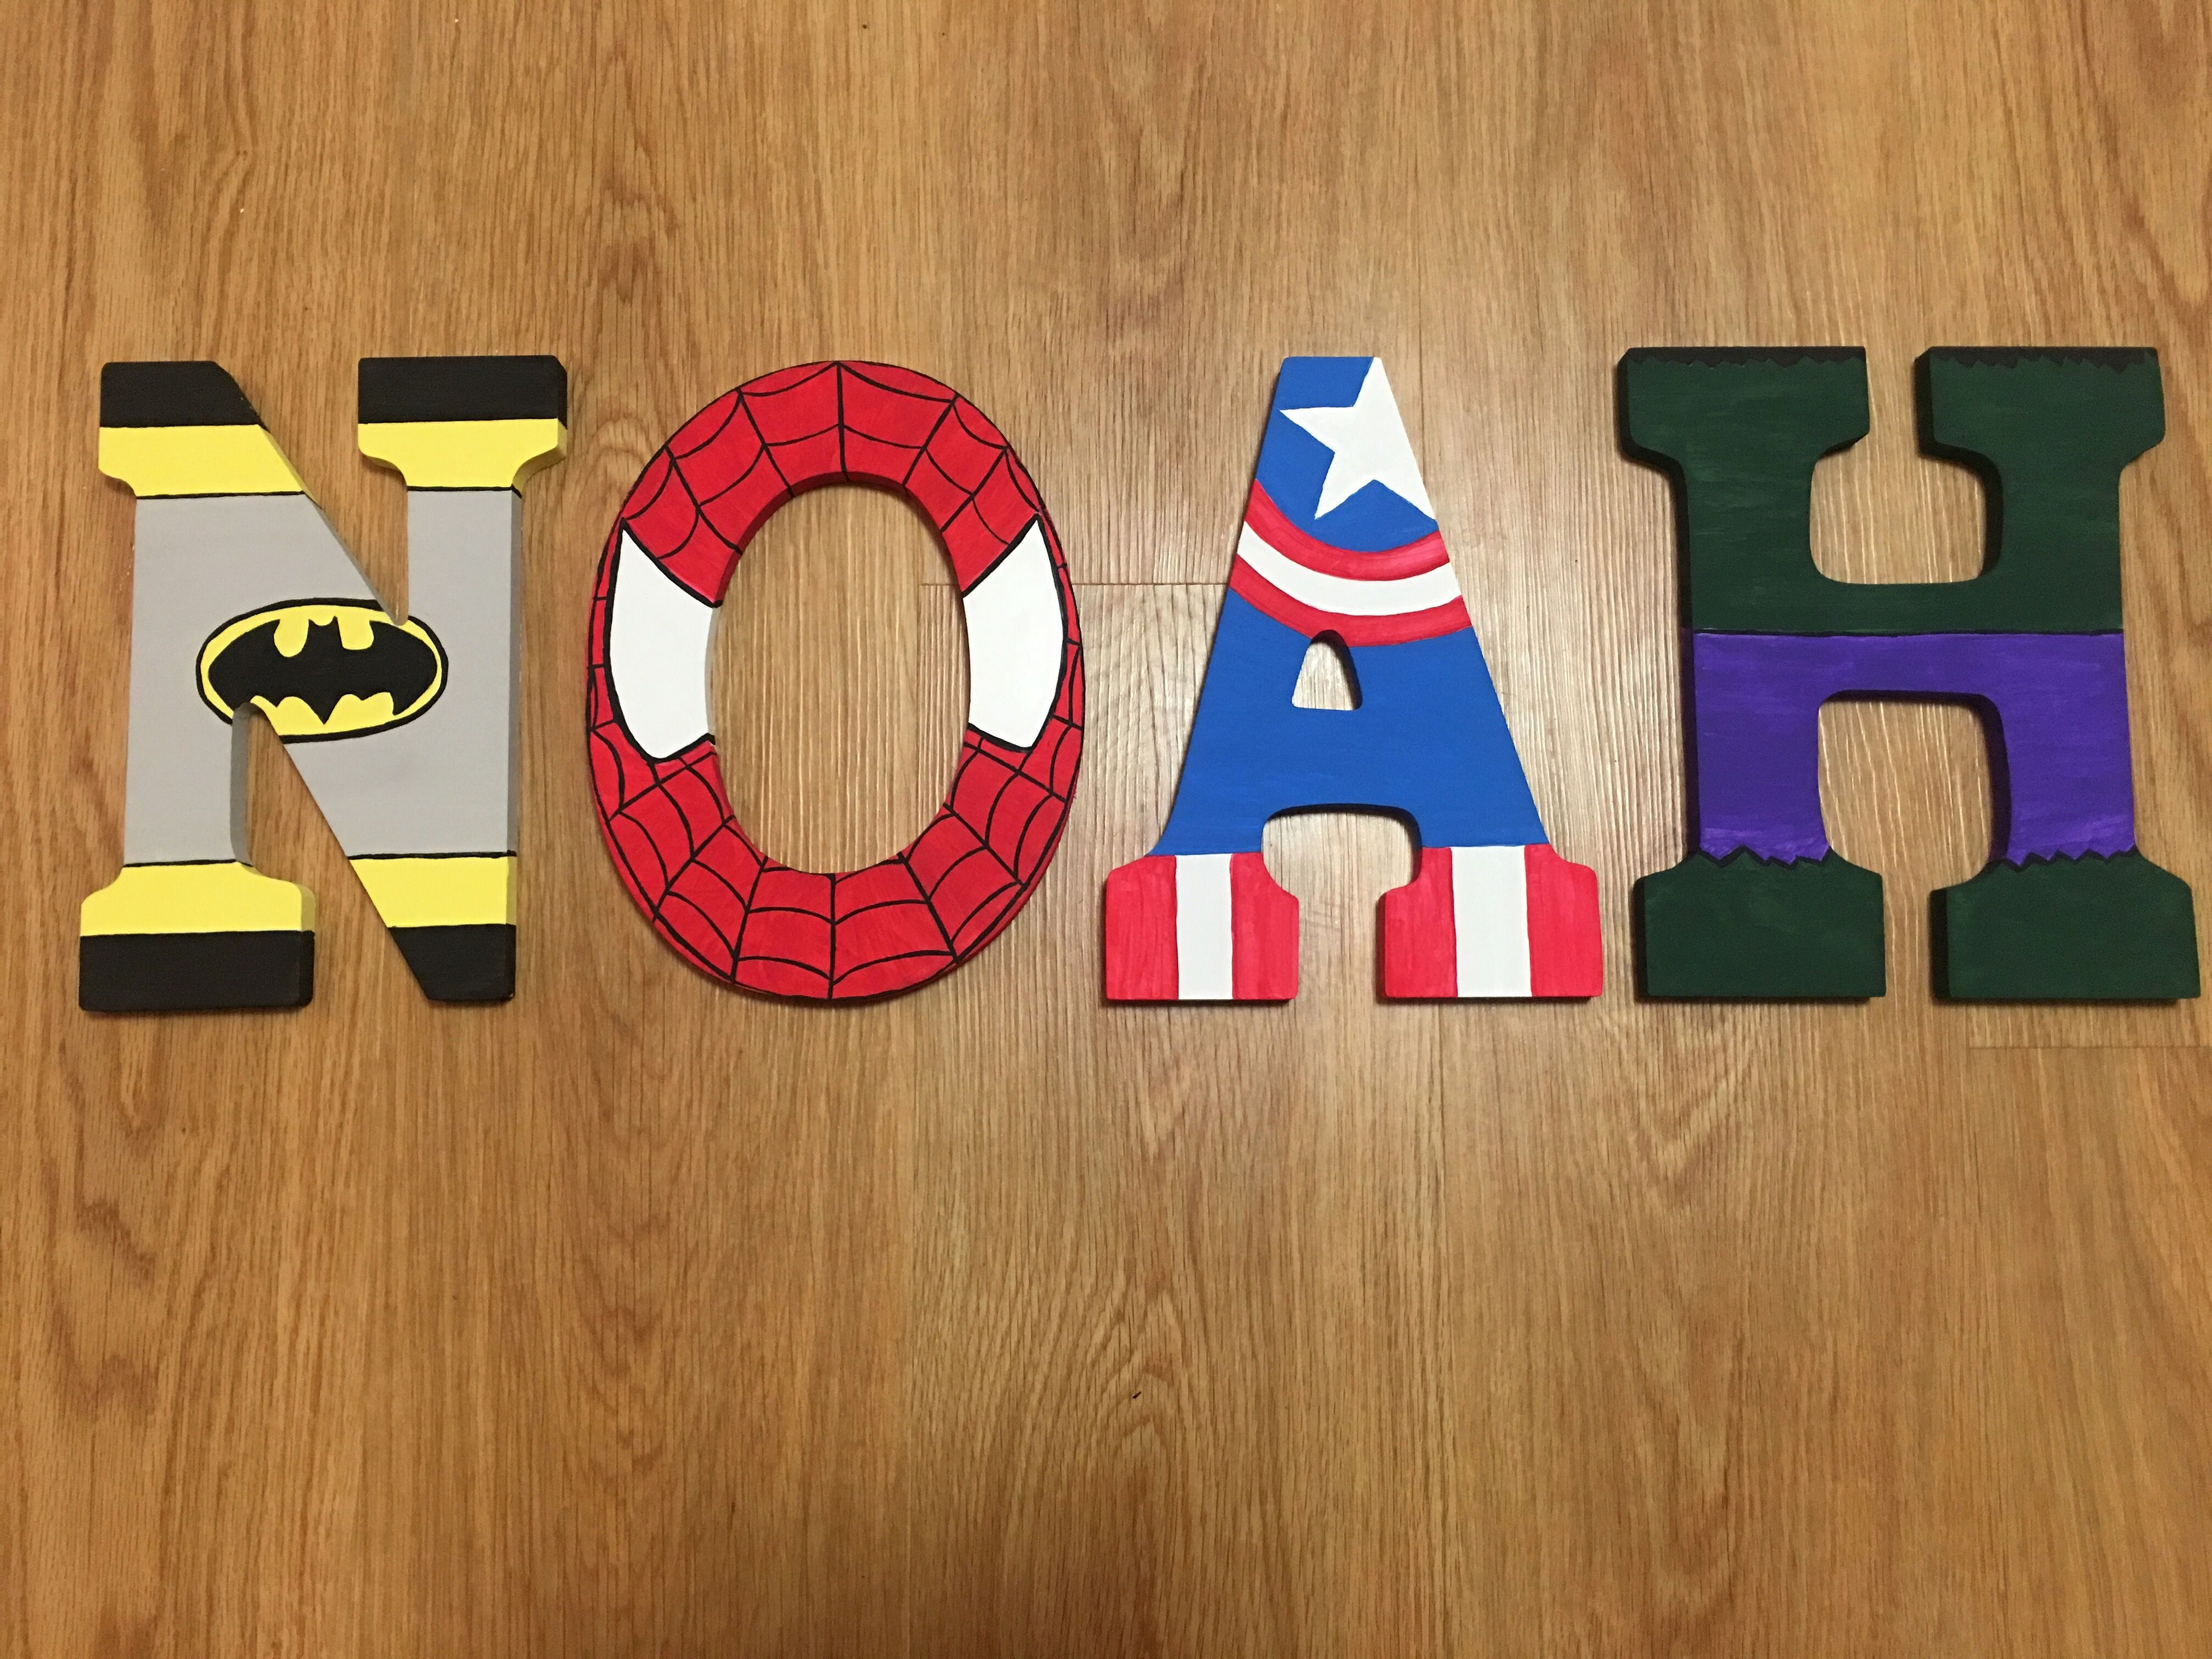 Superhero Letters Avengers Marvel D.C. Comics Batman Spider Man Hulk  Captain America Bedroom Wooden Letters Decor Bedroom